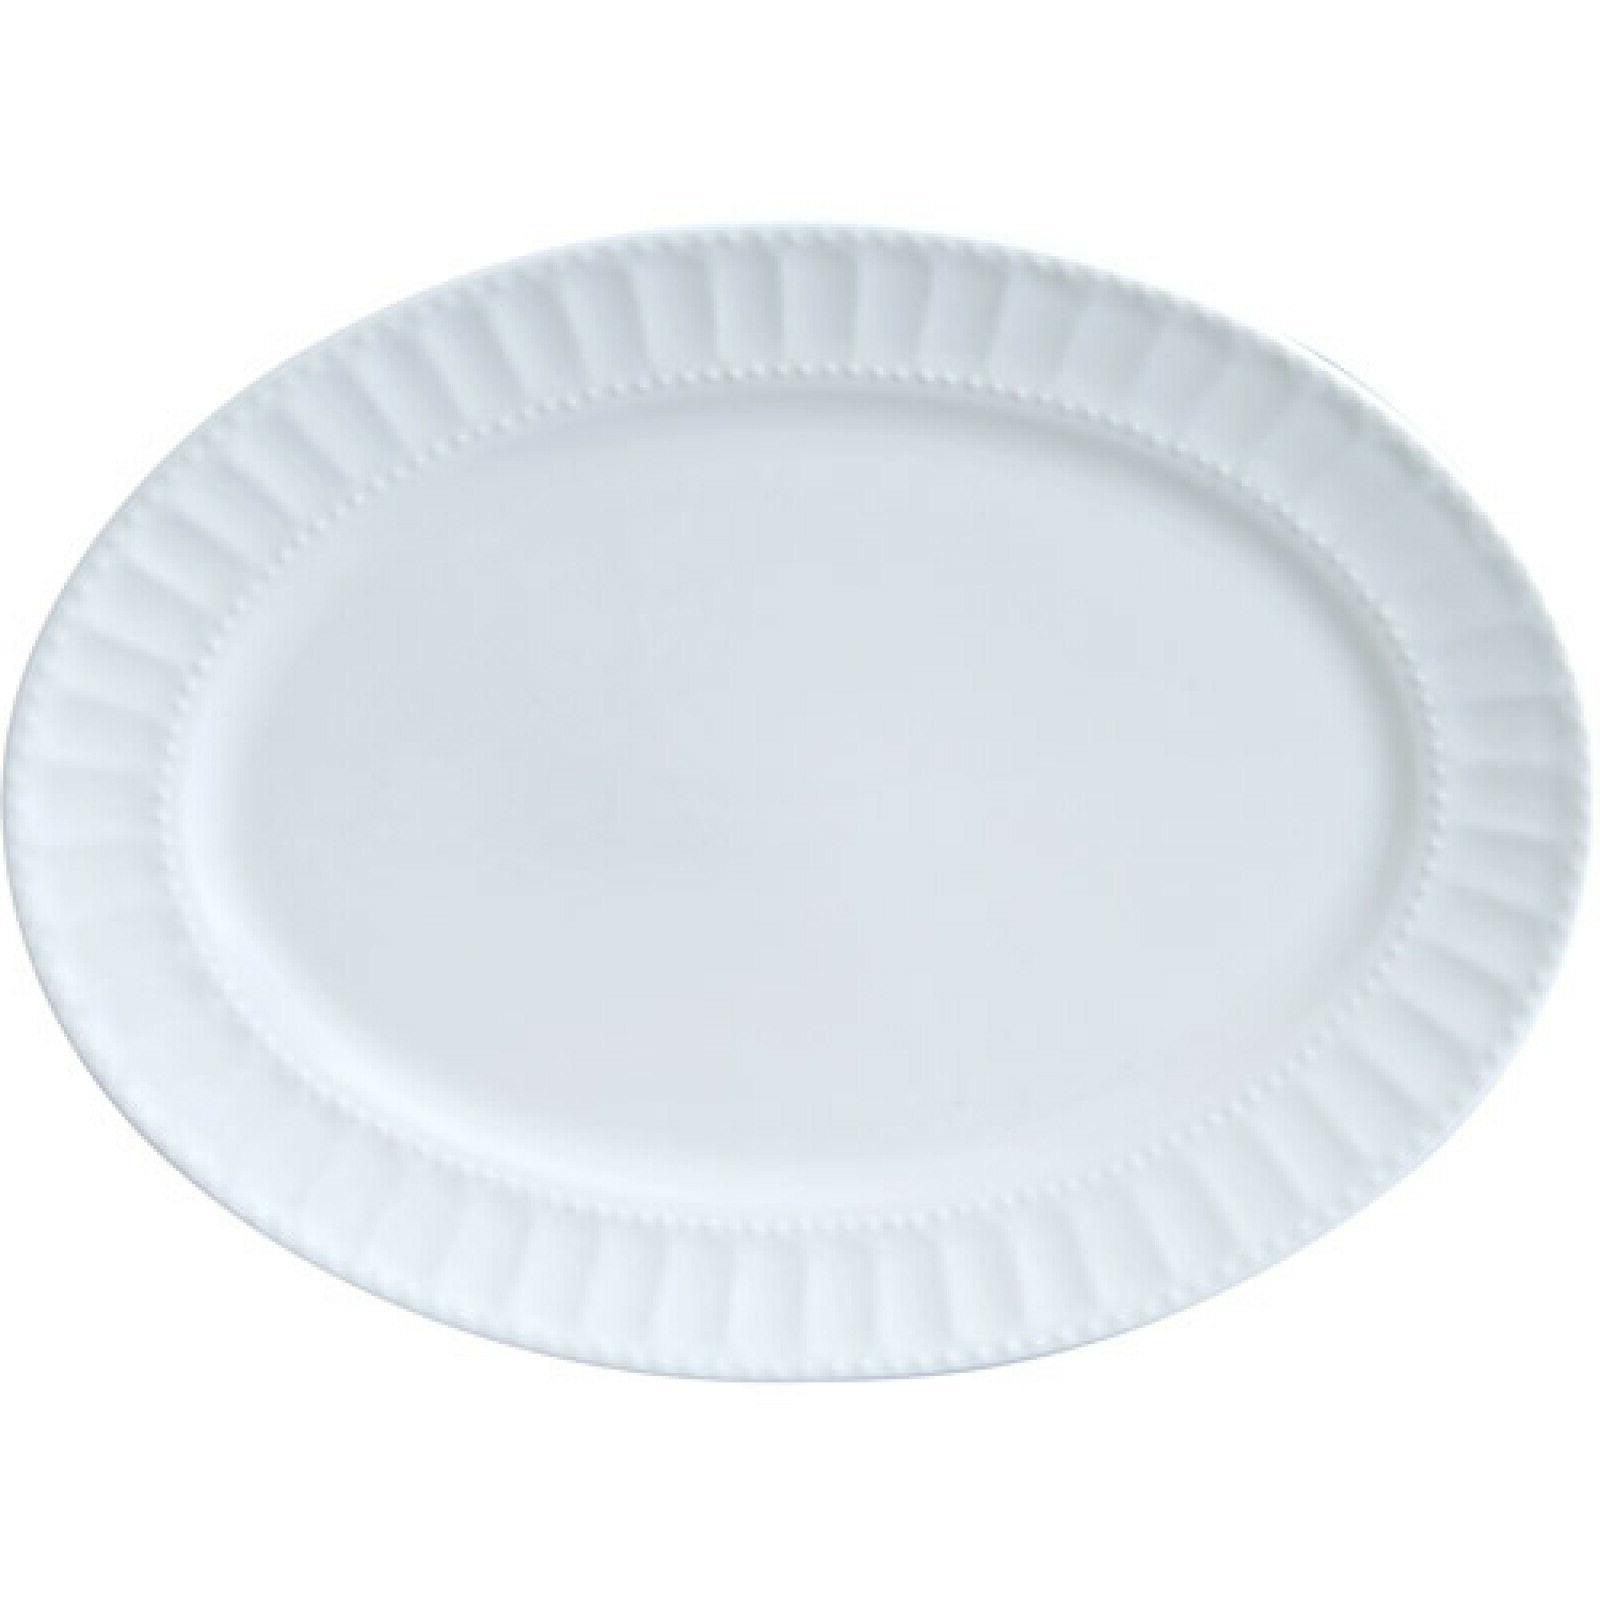 Dinnerware and Service